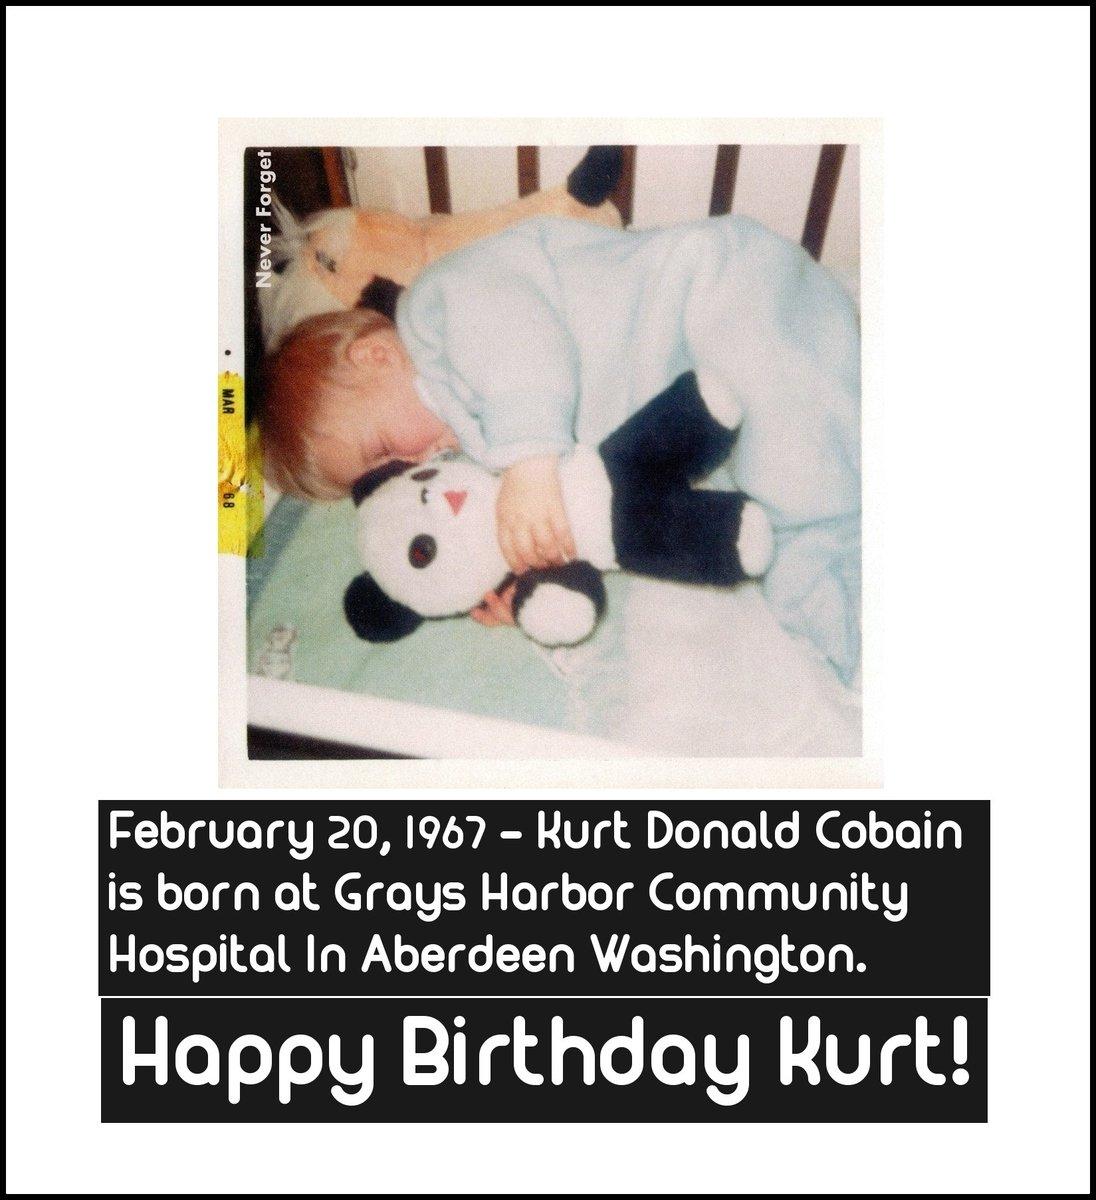 February 20, 1967 – Kurt Cobain is born in Aberdeen Washington. Happy Birthday Kurt! https://t.co/QcP084R58p